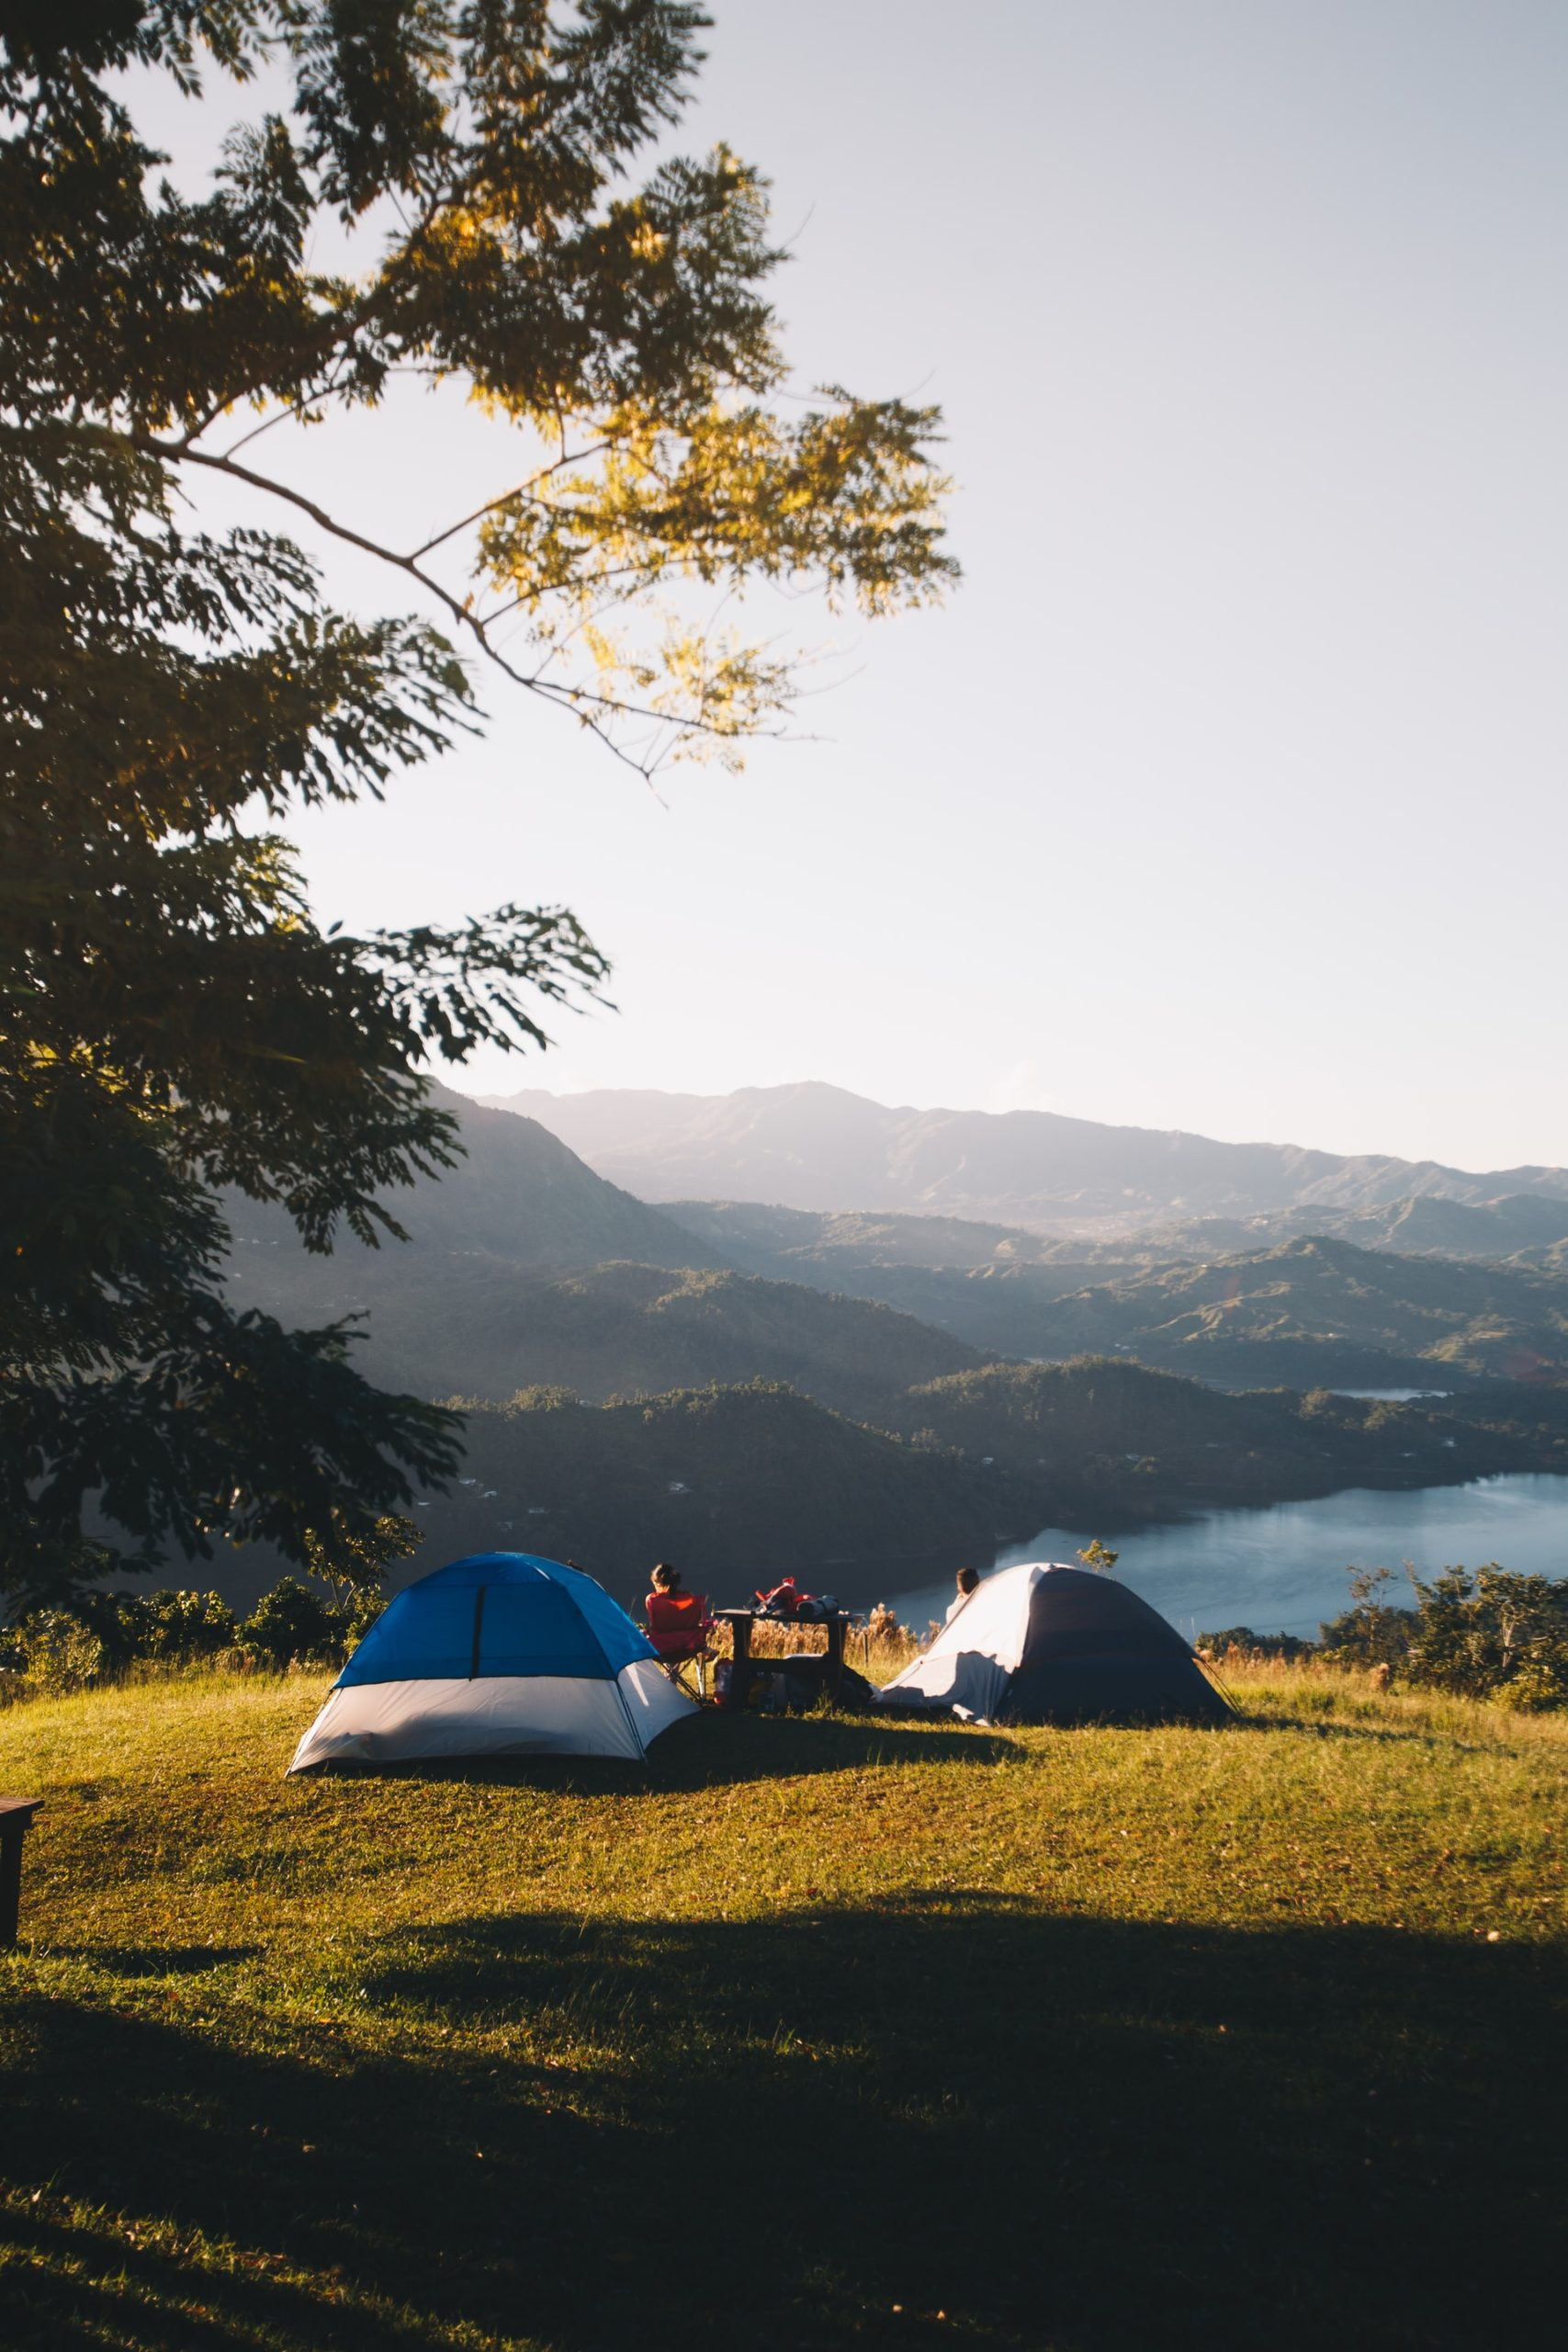 Best Camping Generators Article Image